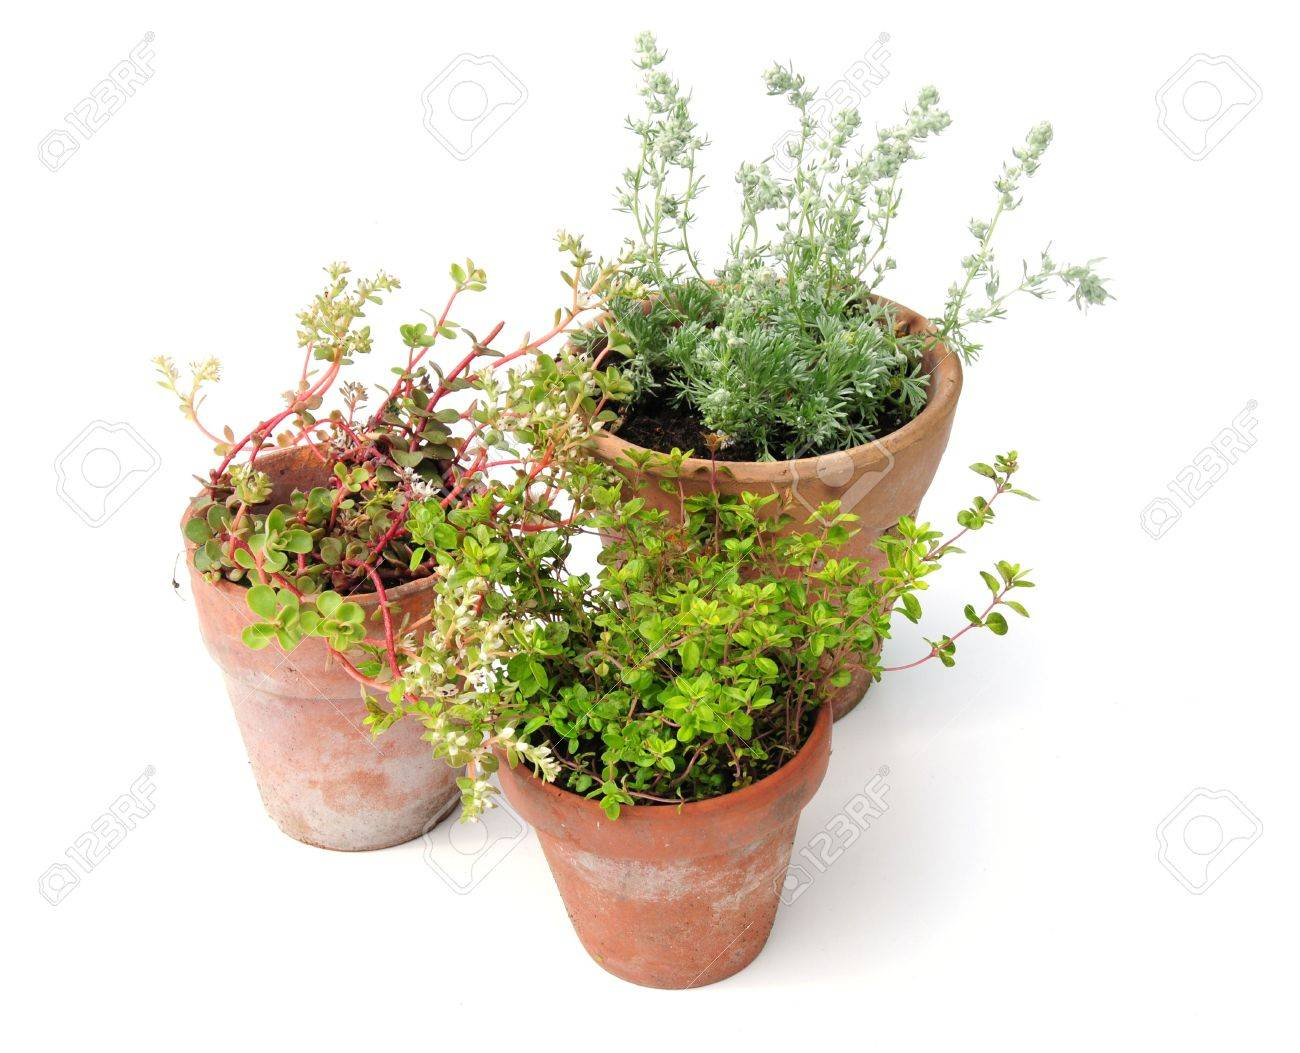 plants in pots Stock Photo - 6981114